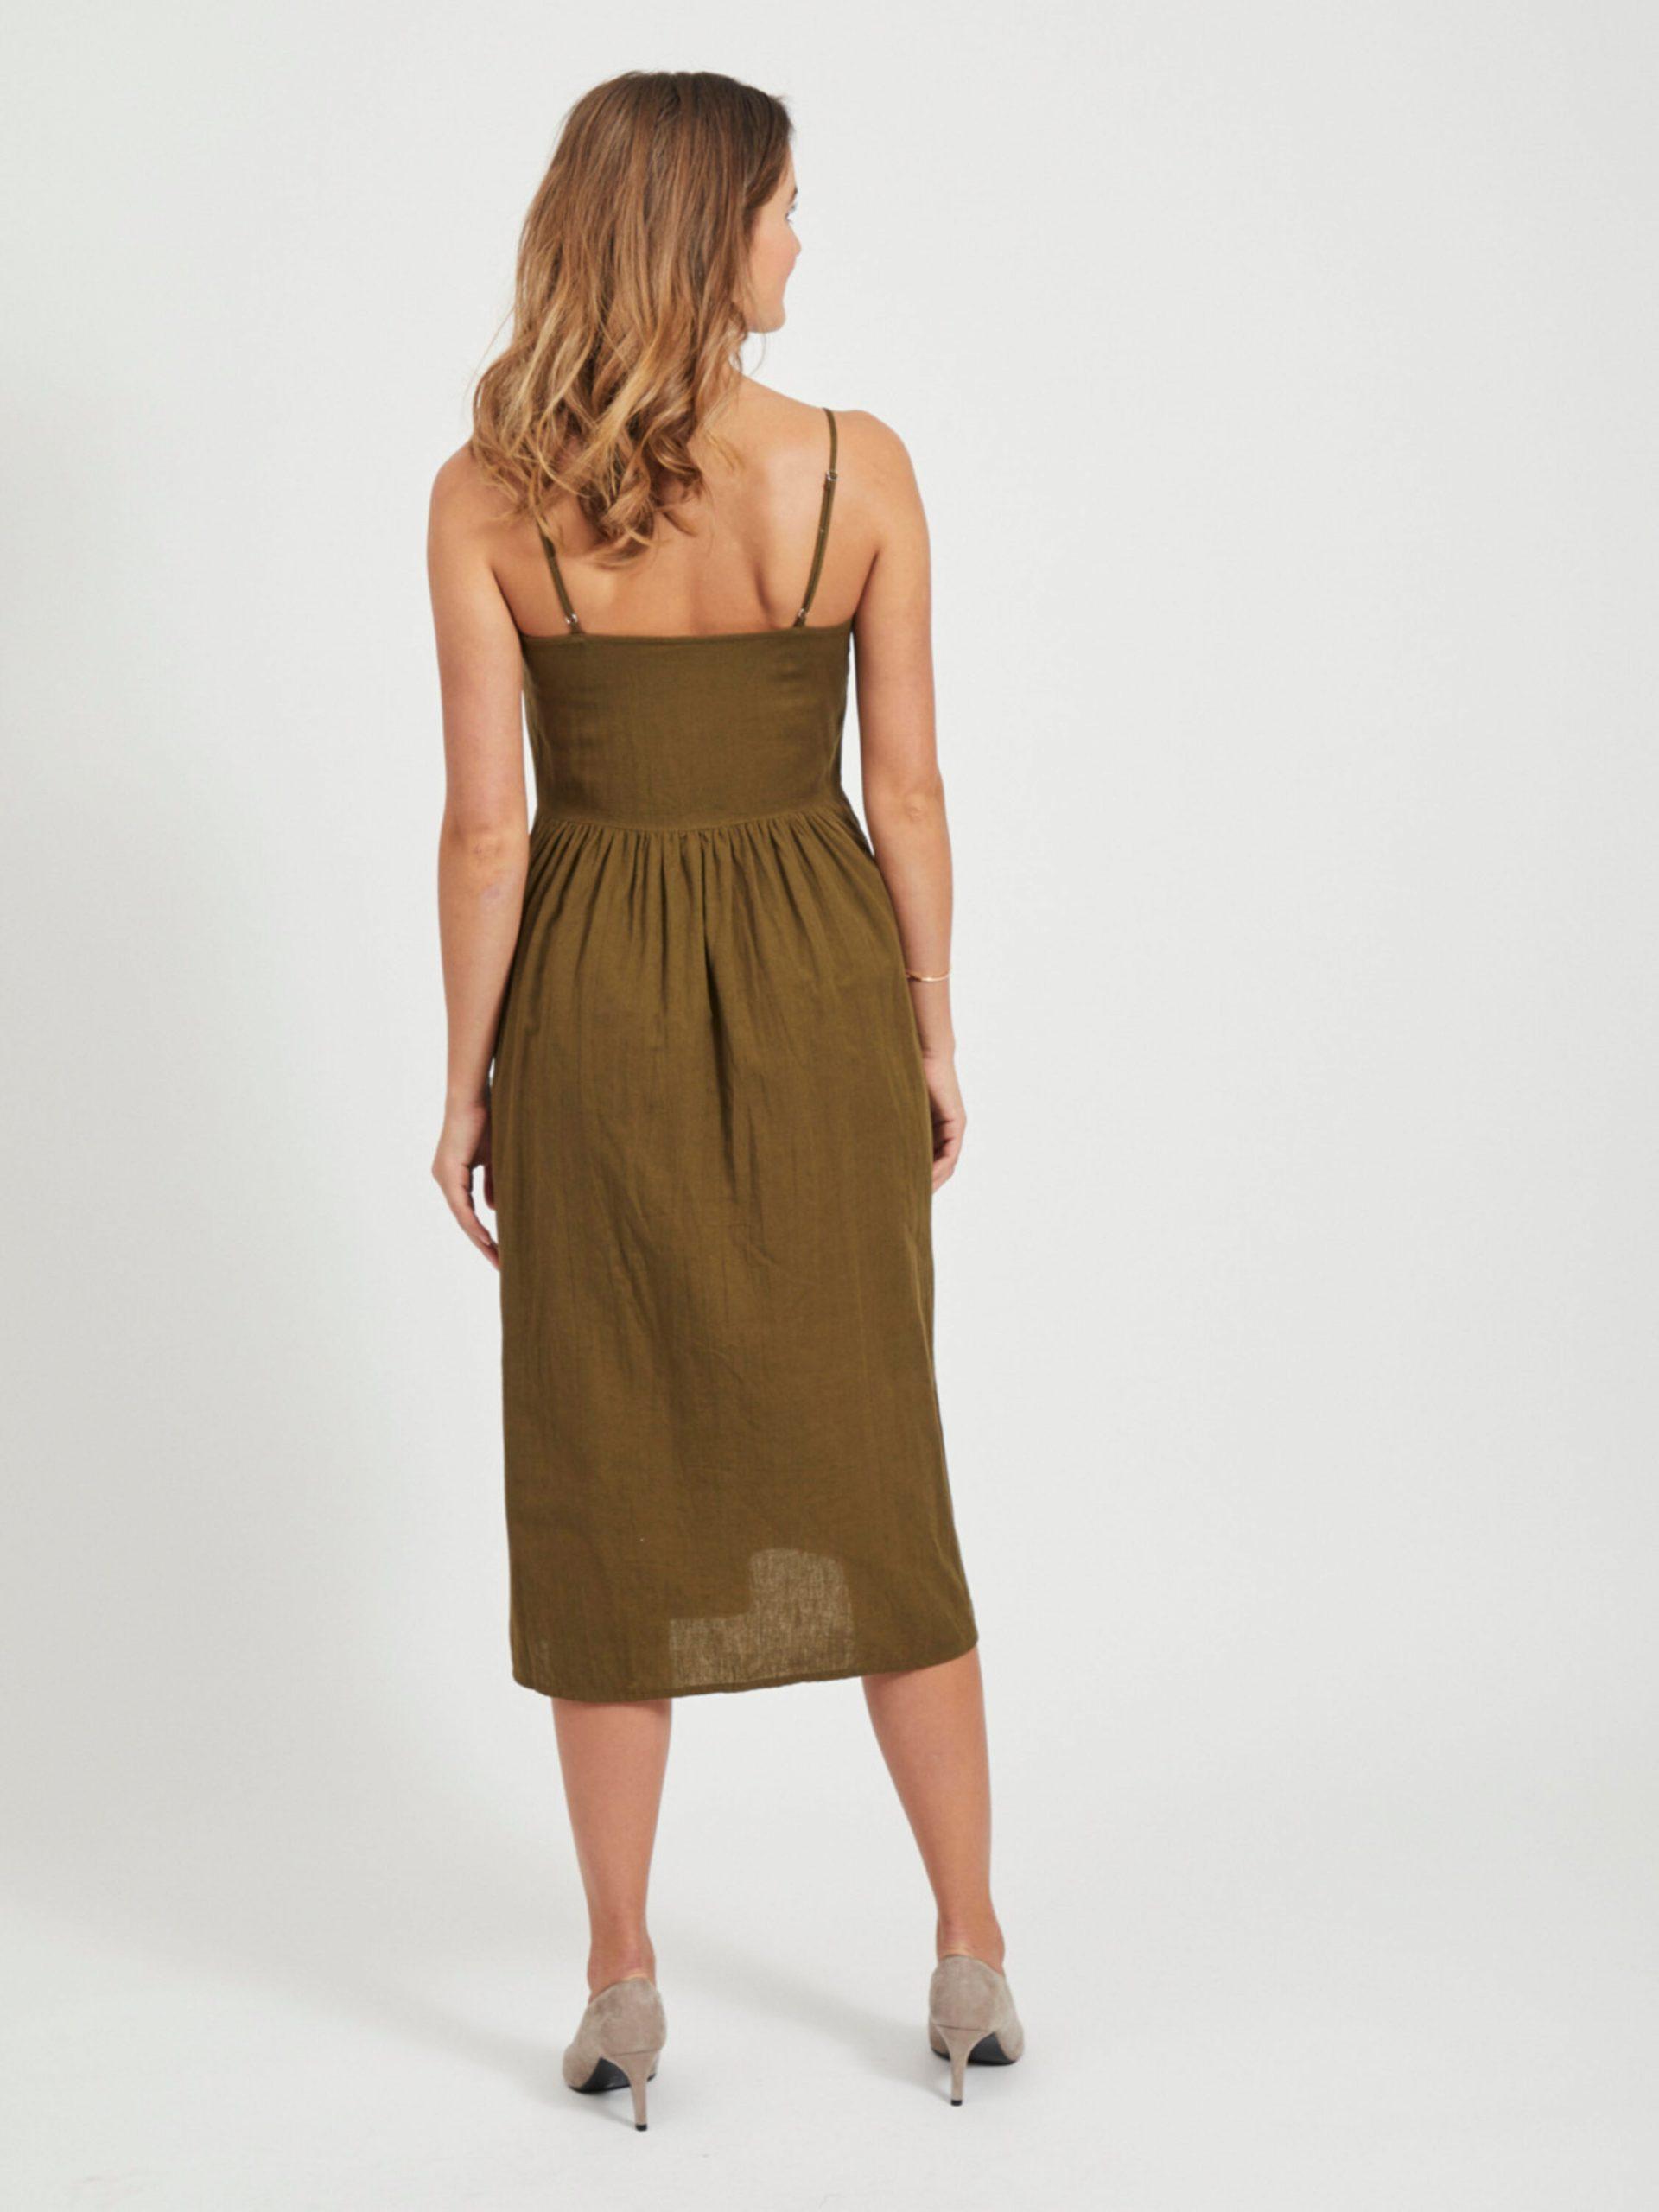 Kleid Vicottanpalmea  Vila Bei Mode Löning